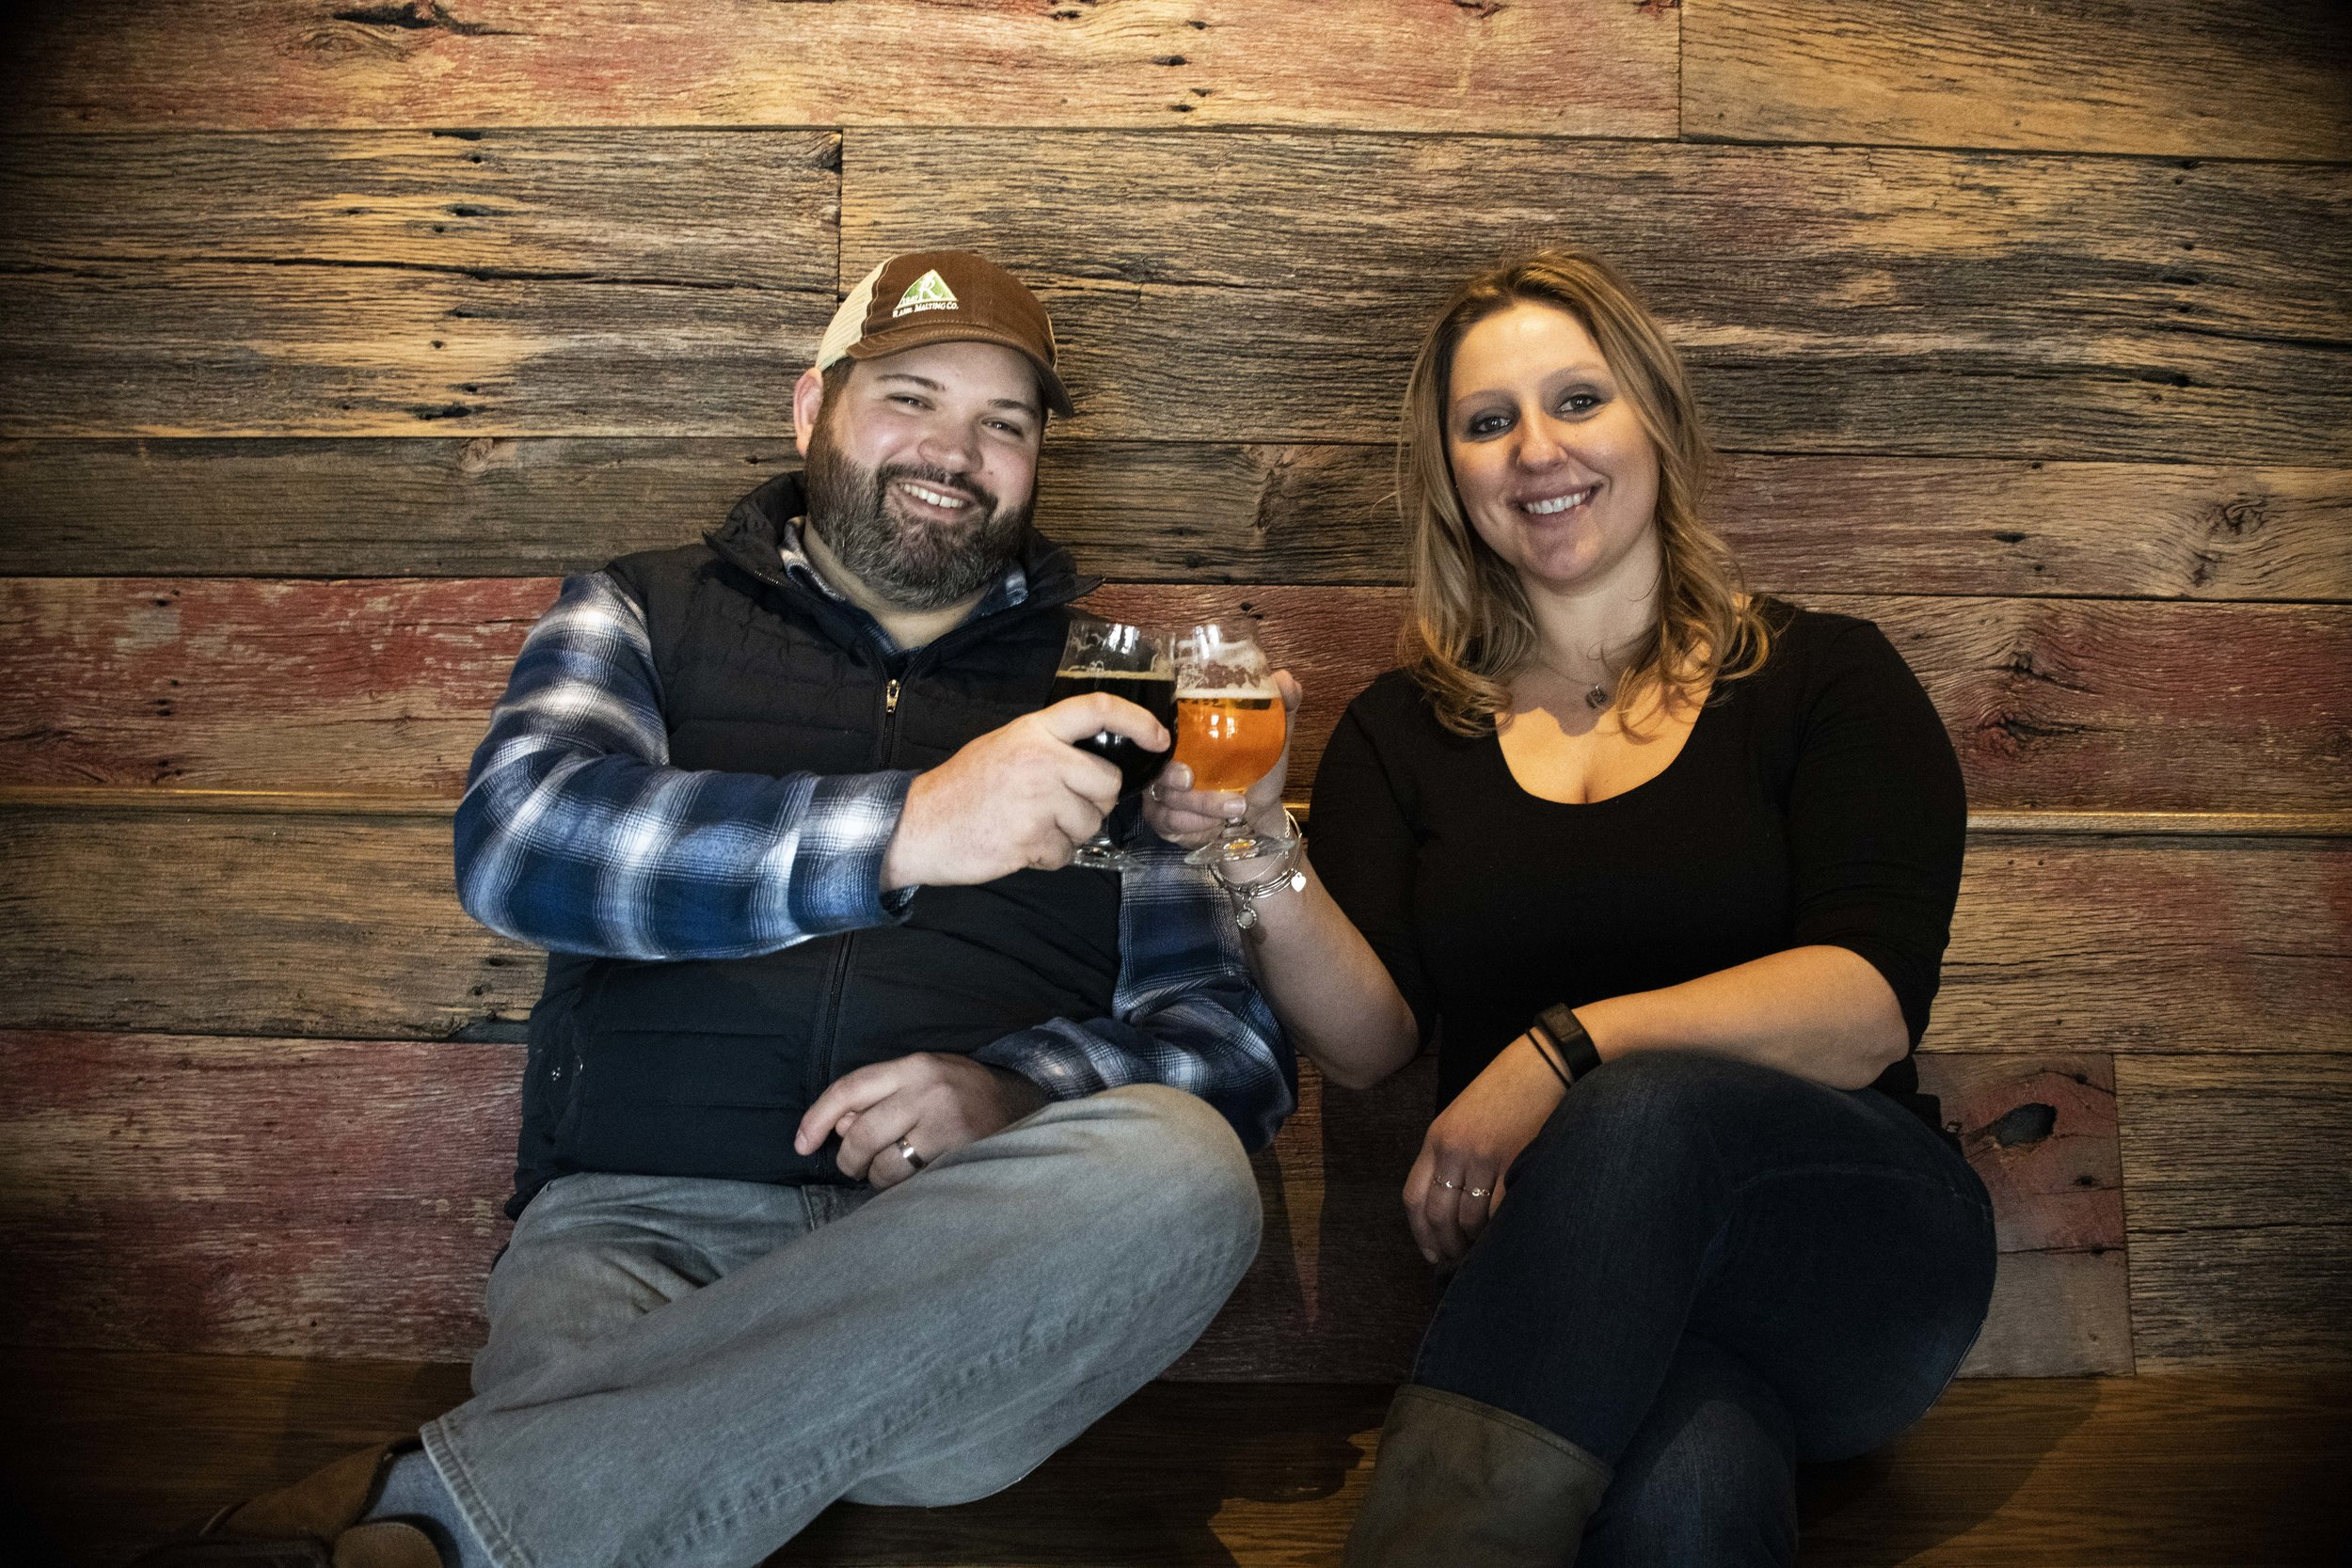 Jay Southwood and Vilija Bizinkauskas of Break Rock Brewing Company.